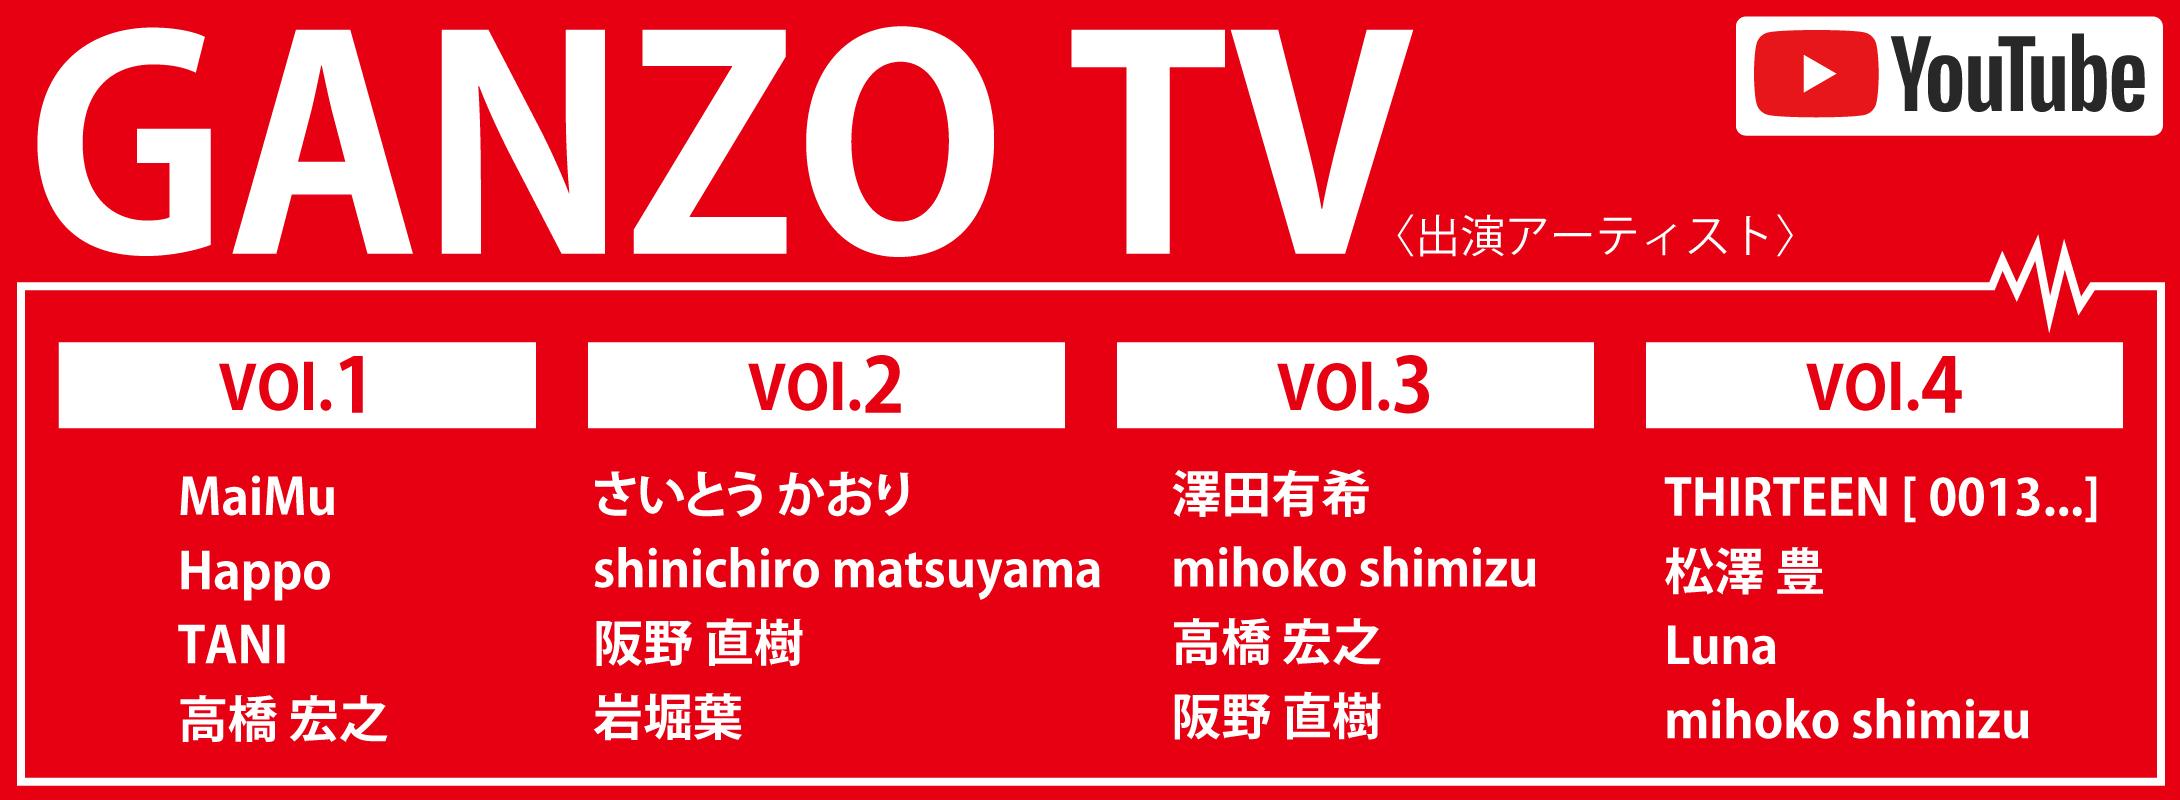 GANZO TV